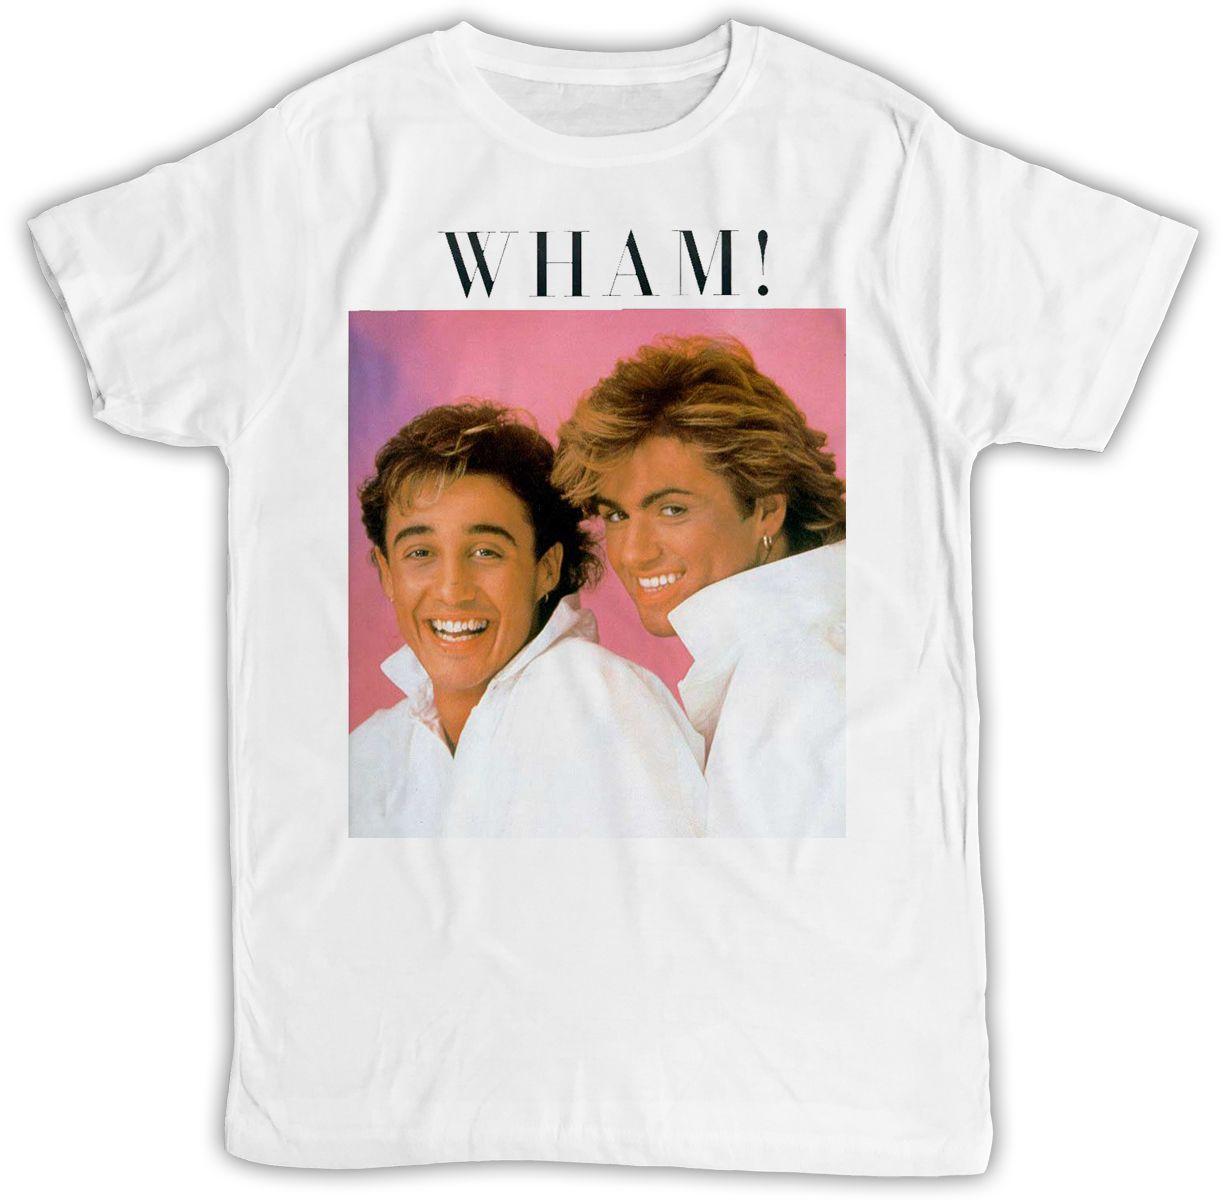 6d33d4d0 GEORGE MICHAEL WHAM POSTER IDEAL GIFT BIRTHDAY PRESENT COOL RETRO T SHIRT  Cool T Shirts Designs Make T Shirts Online From Emisaputr, $10.8| DHgate.Com